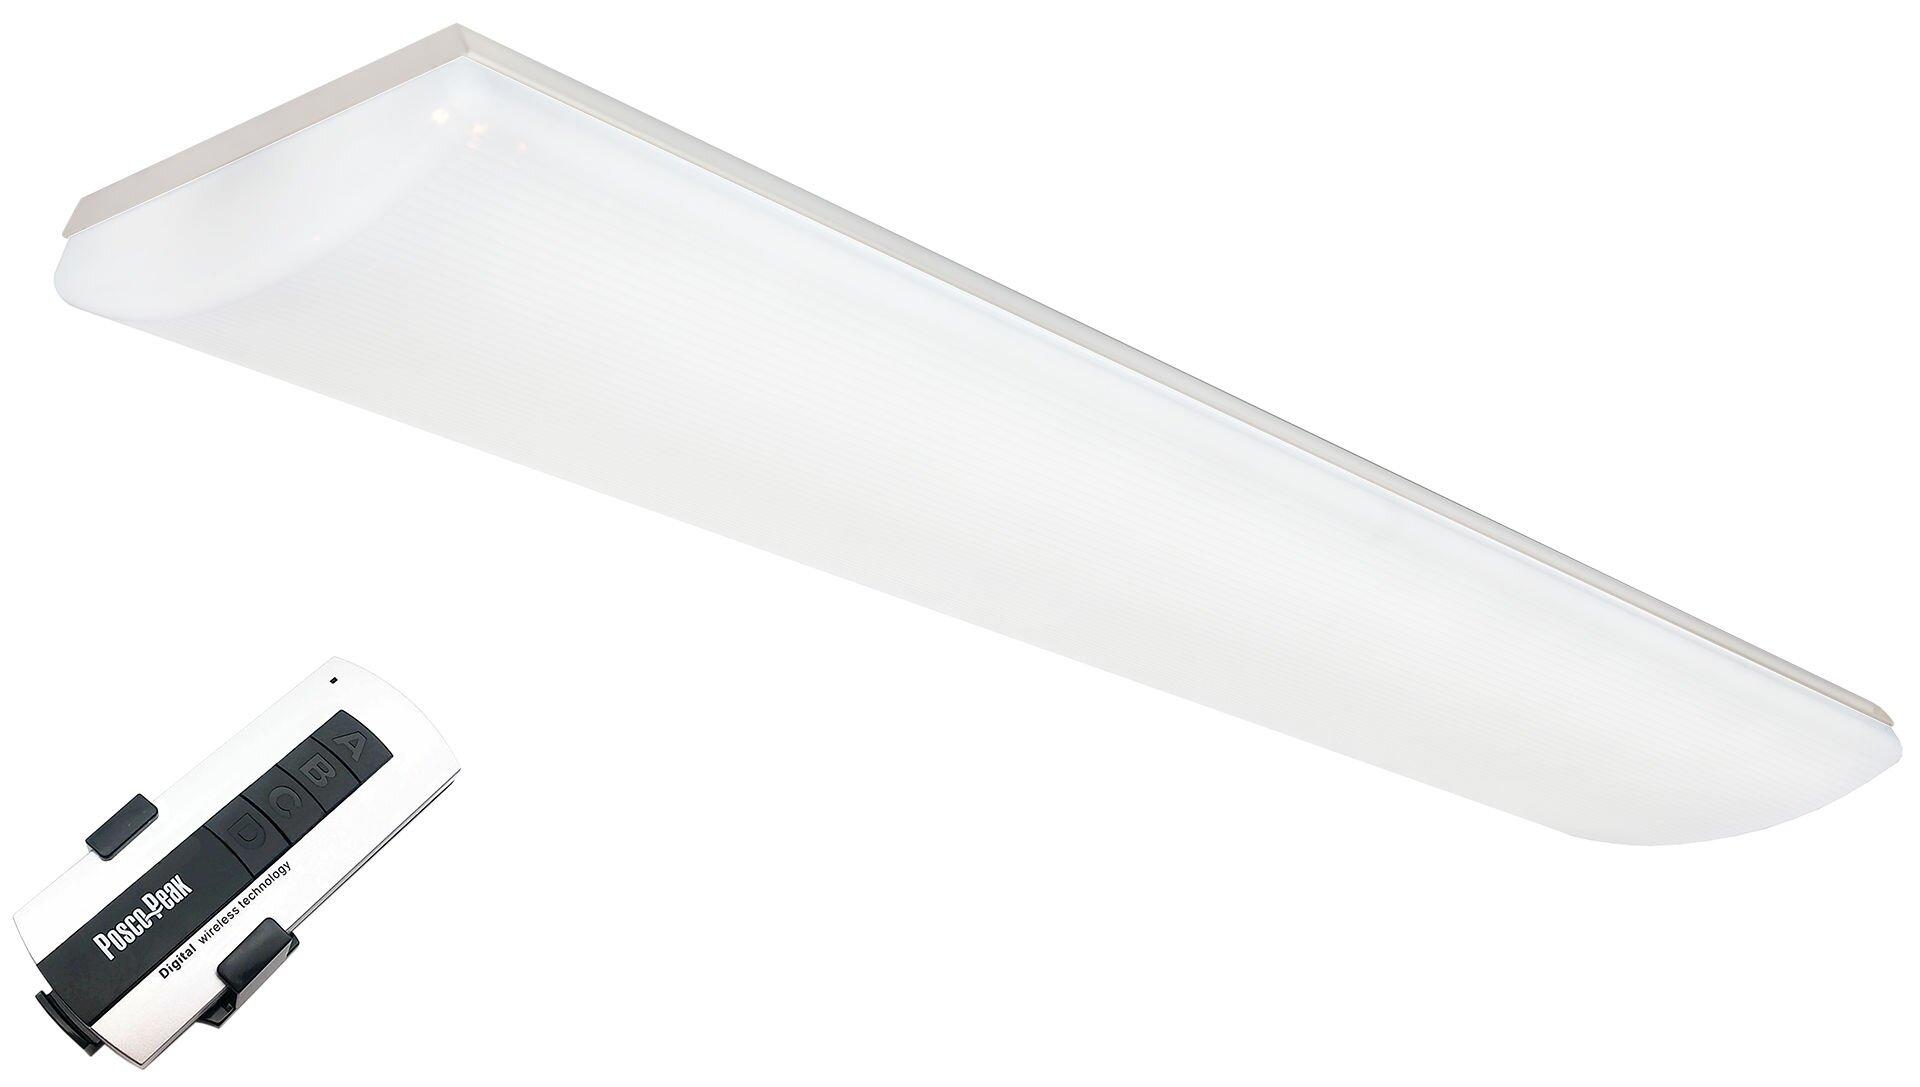 Led светильник Modus с пультом ДУ (4 канала) - фото pic_a7d83b5f0623fd9_1920x9000_1.jpg